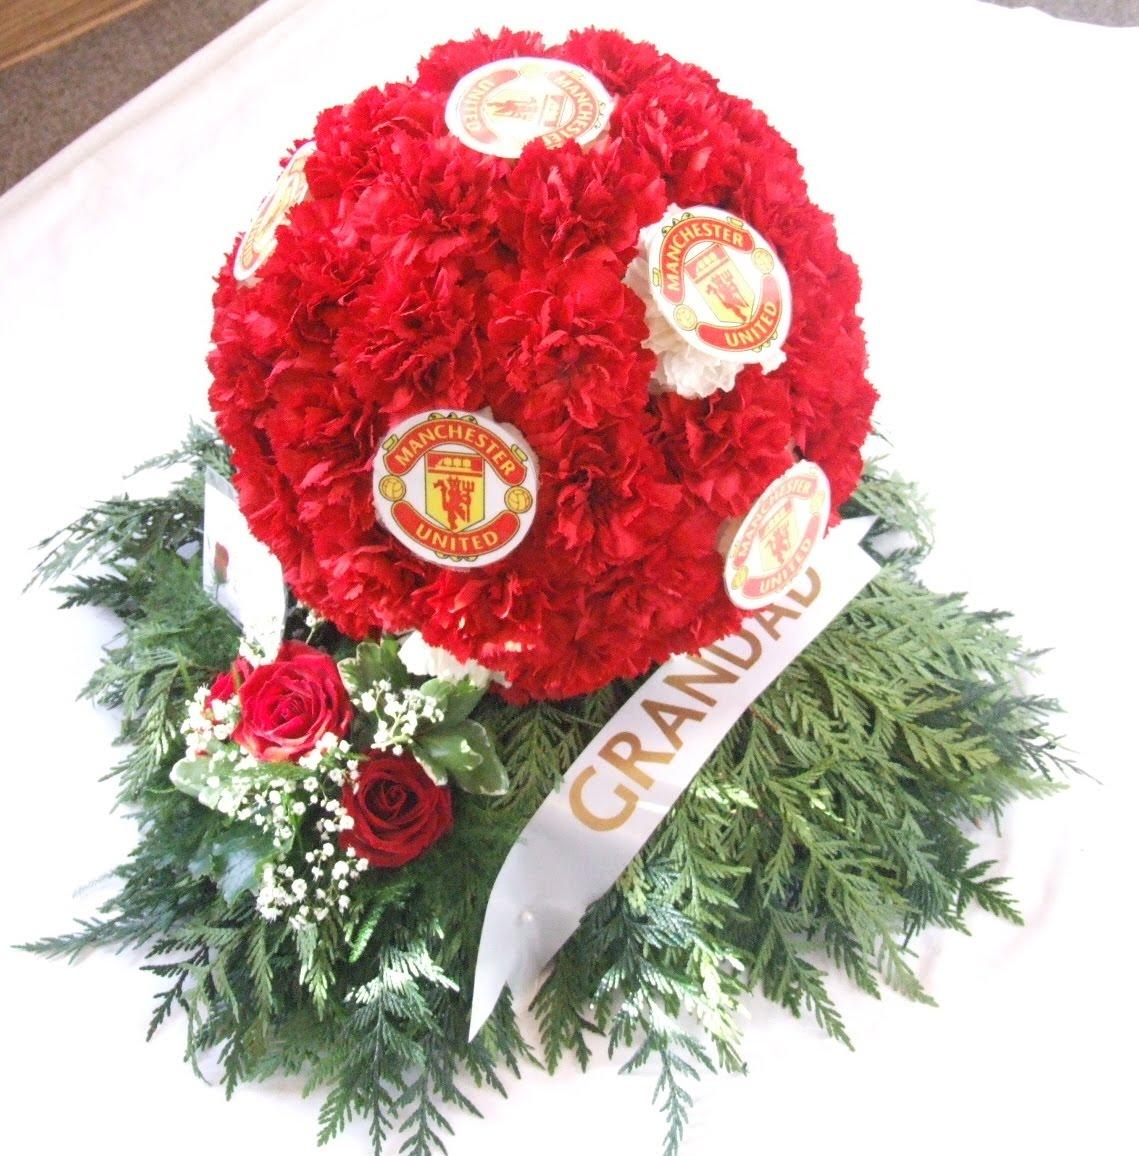 Rjs florist funeral tributes a pint of beer izmirmasajfo